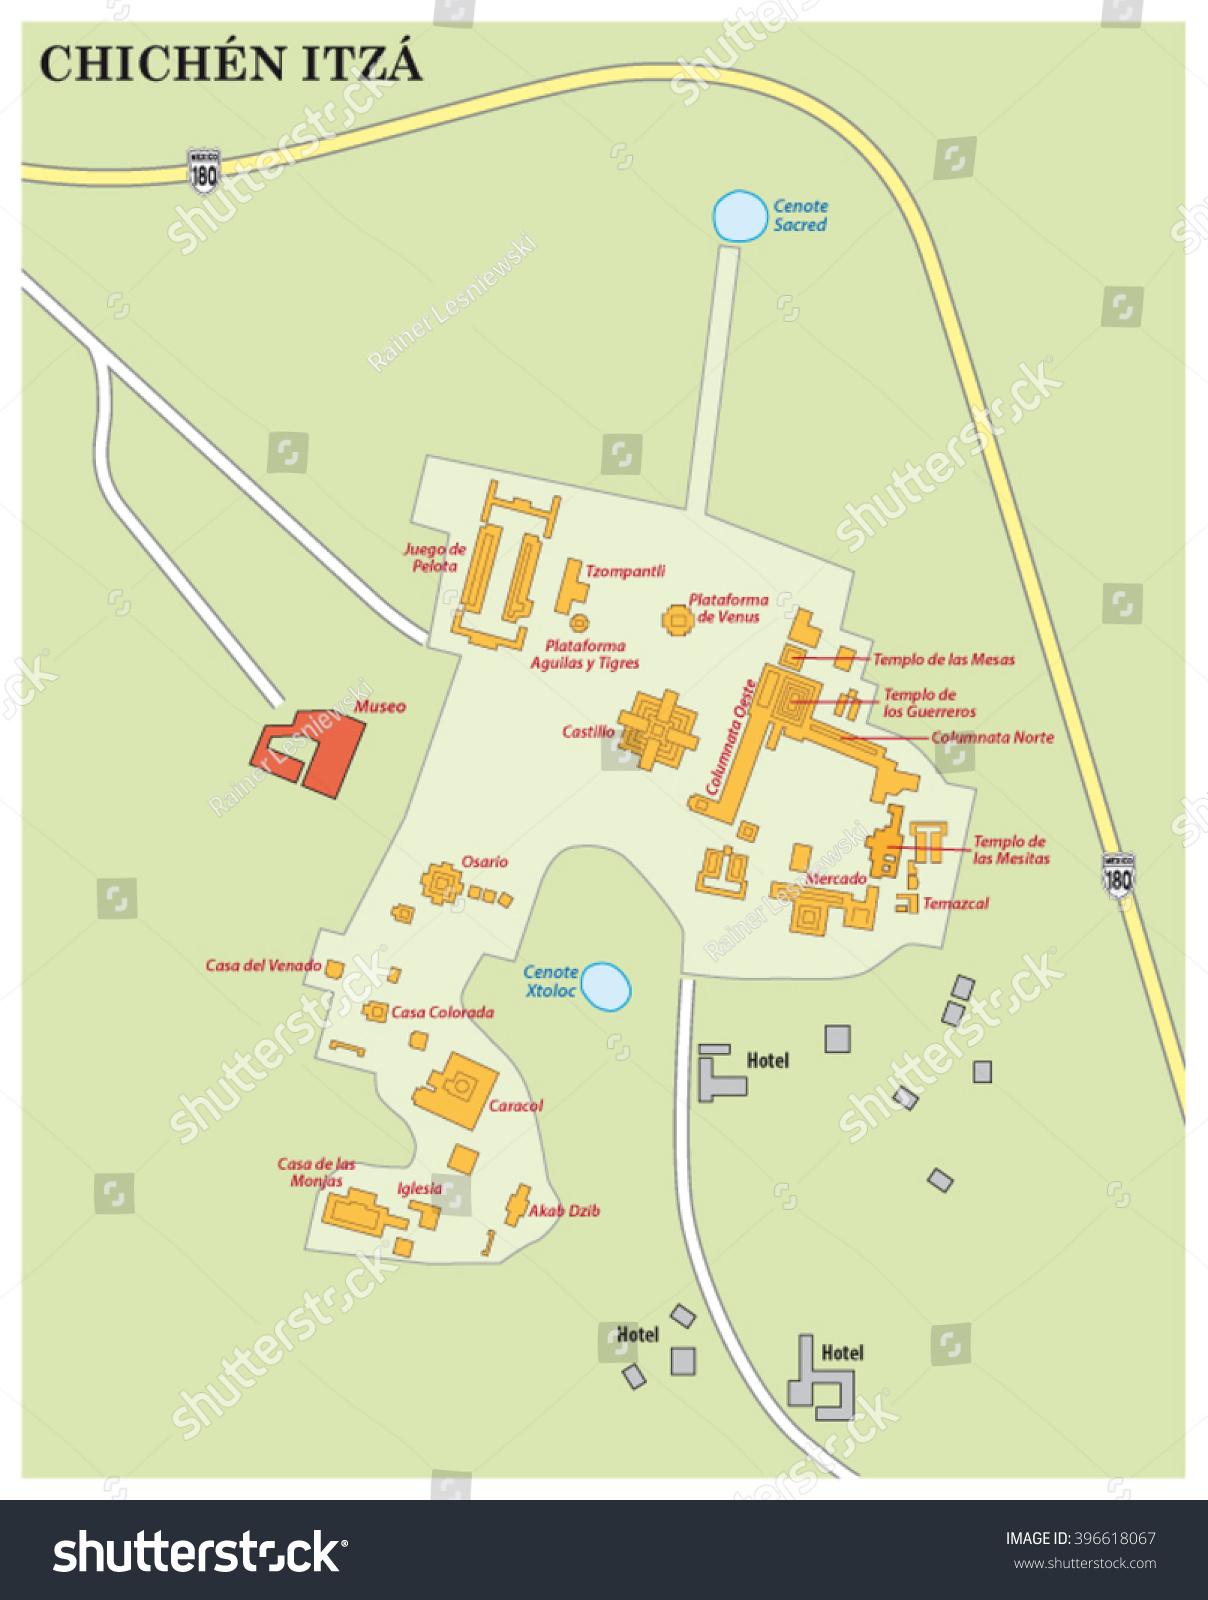 Map Maya Ruin Site Chichen Itza Stock Vector Shutterstock - Chichen itza map